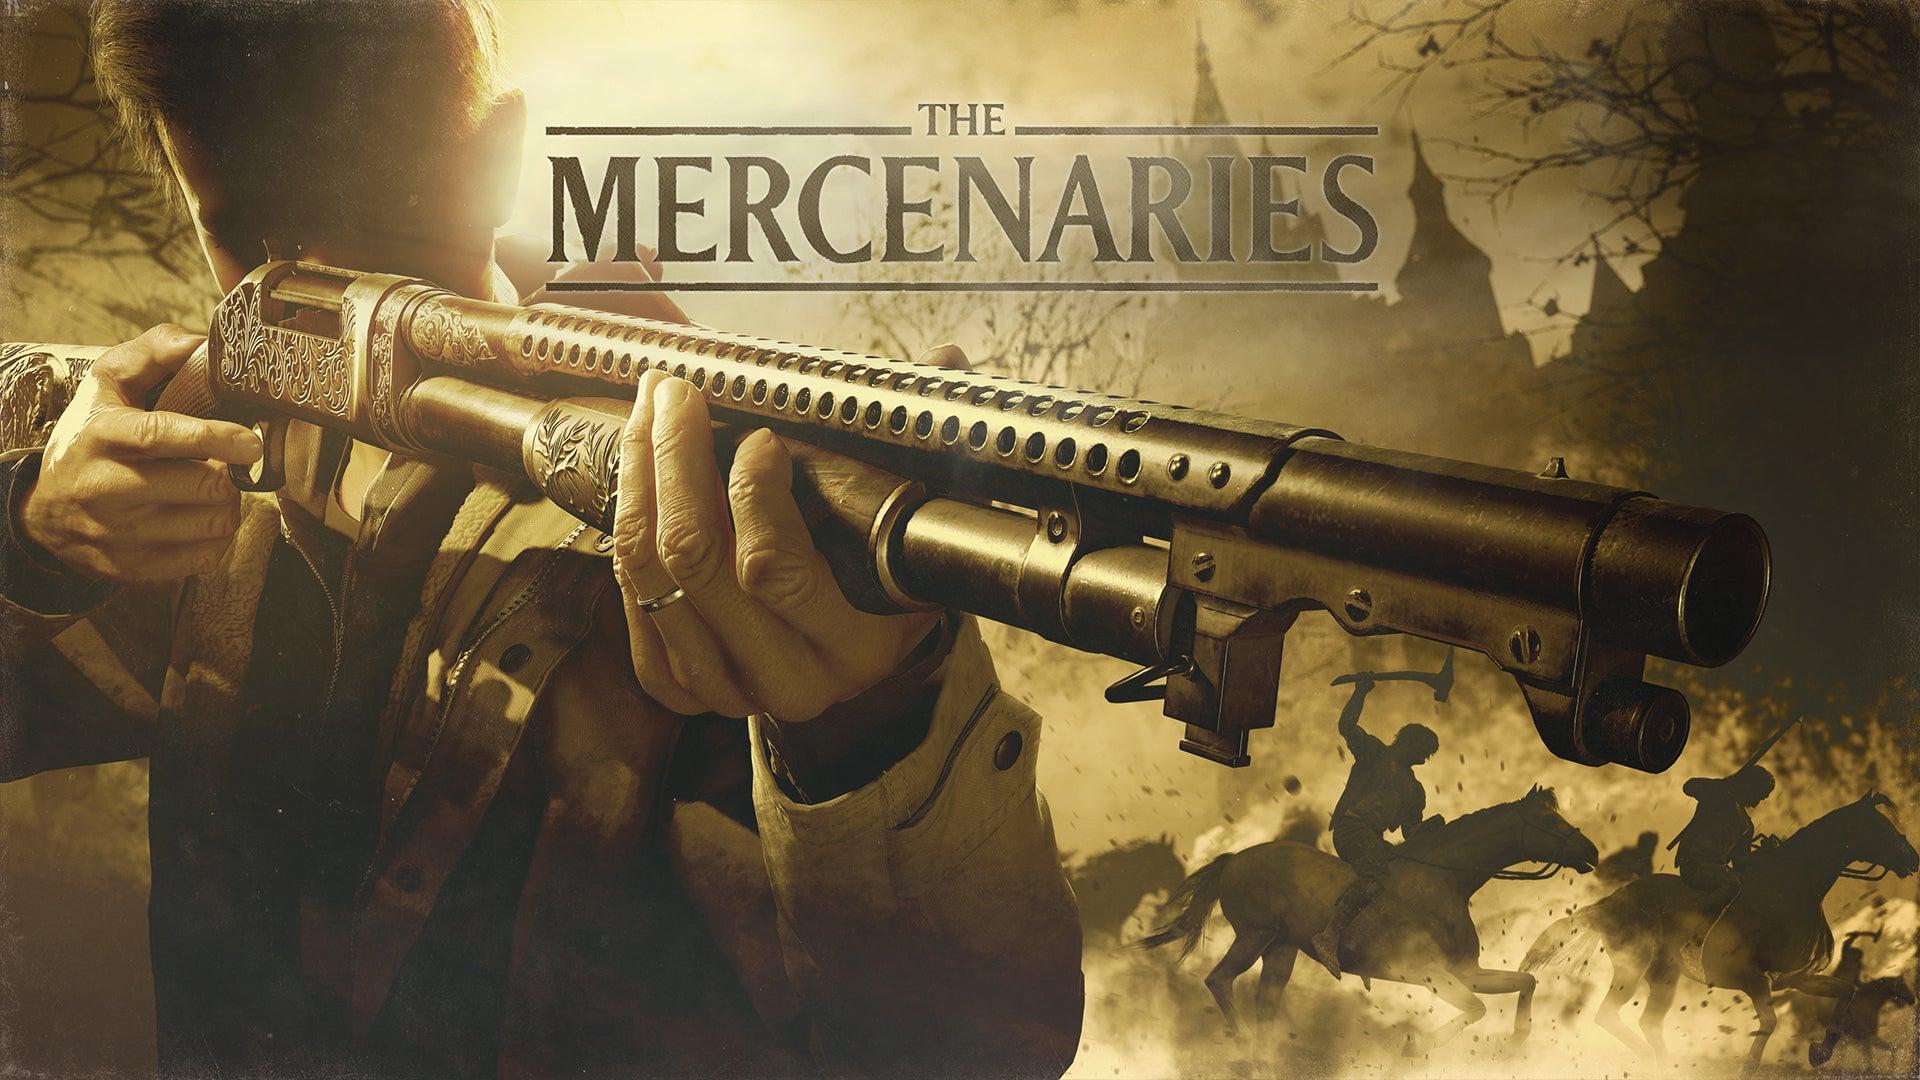 Image for Resident Evil Village Mercenaries Rewards | How to get SS Rank